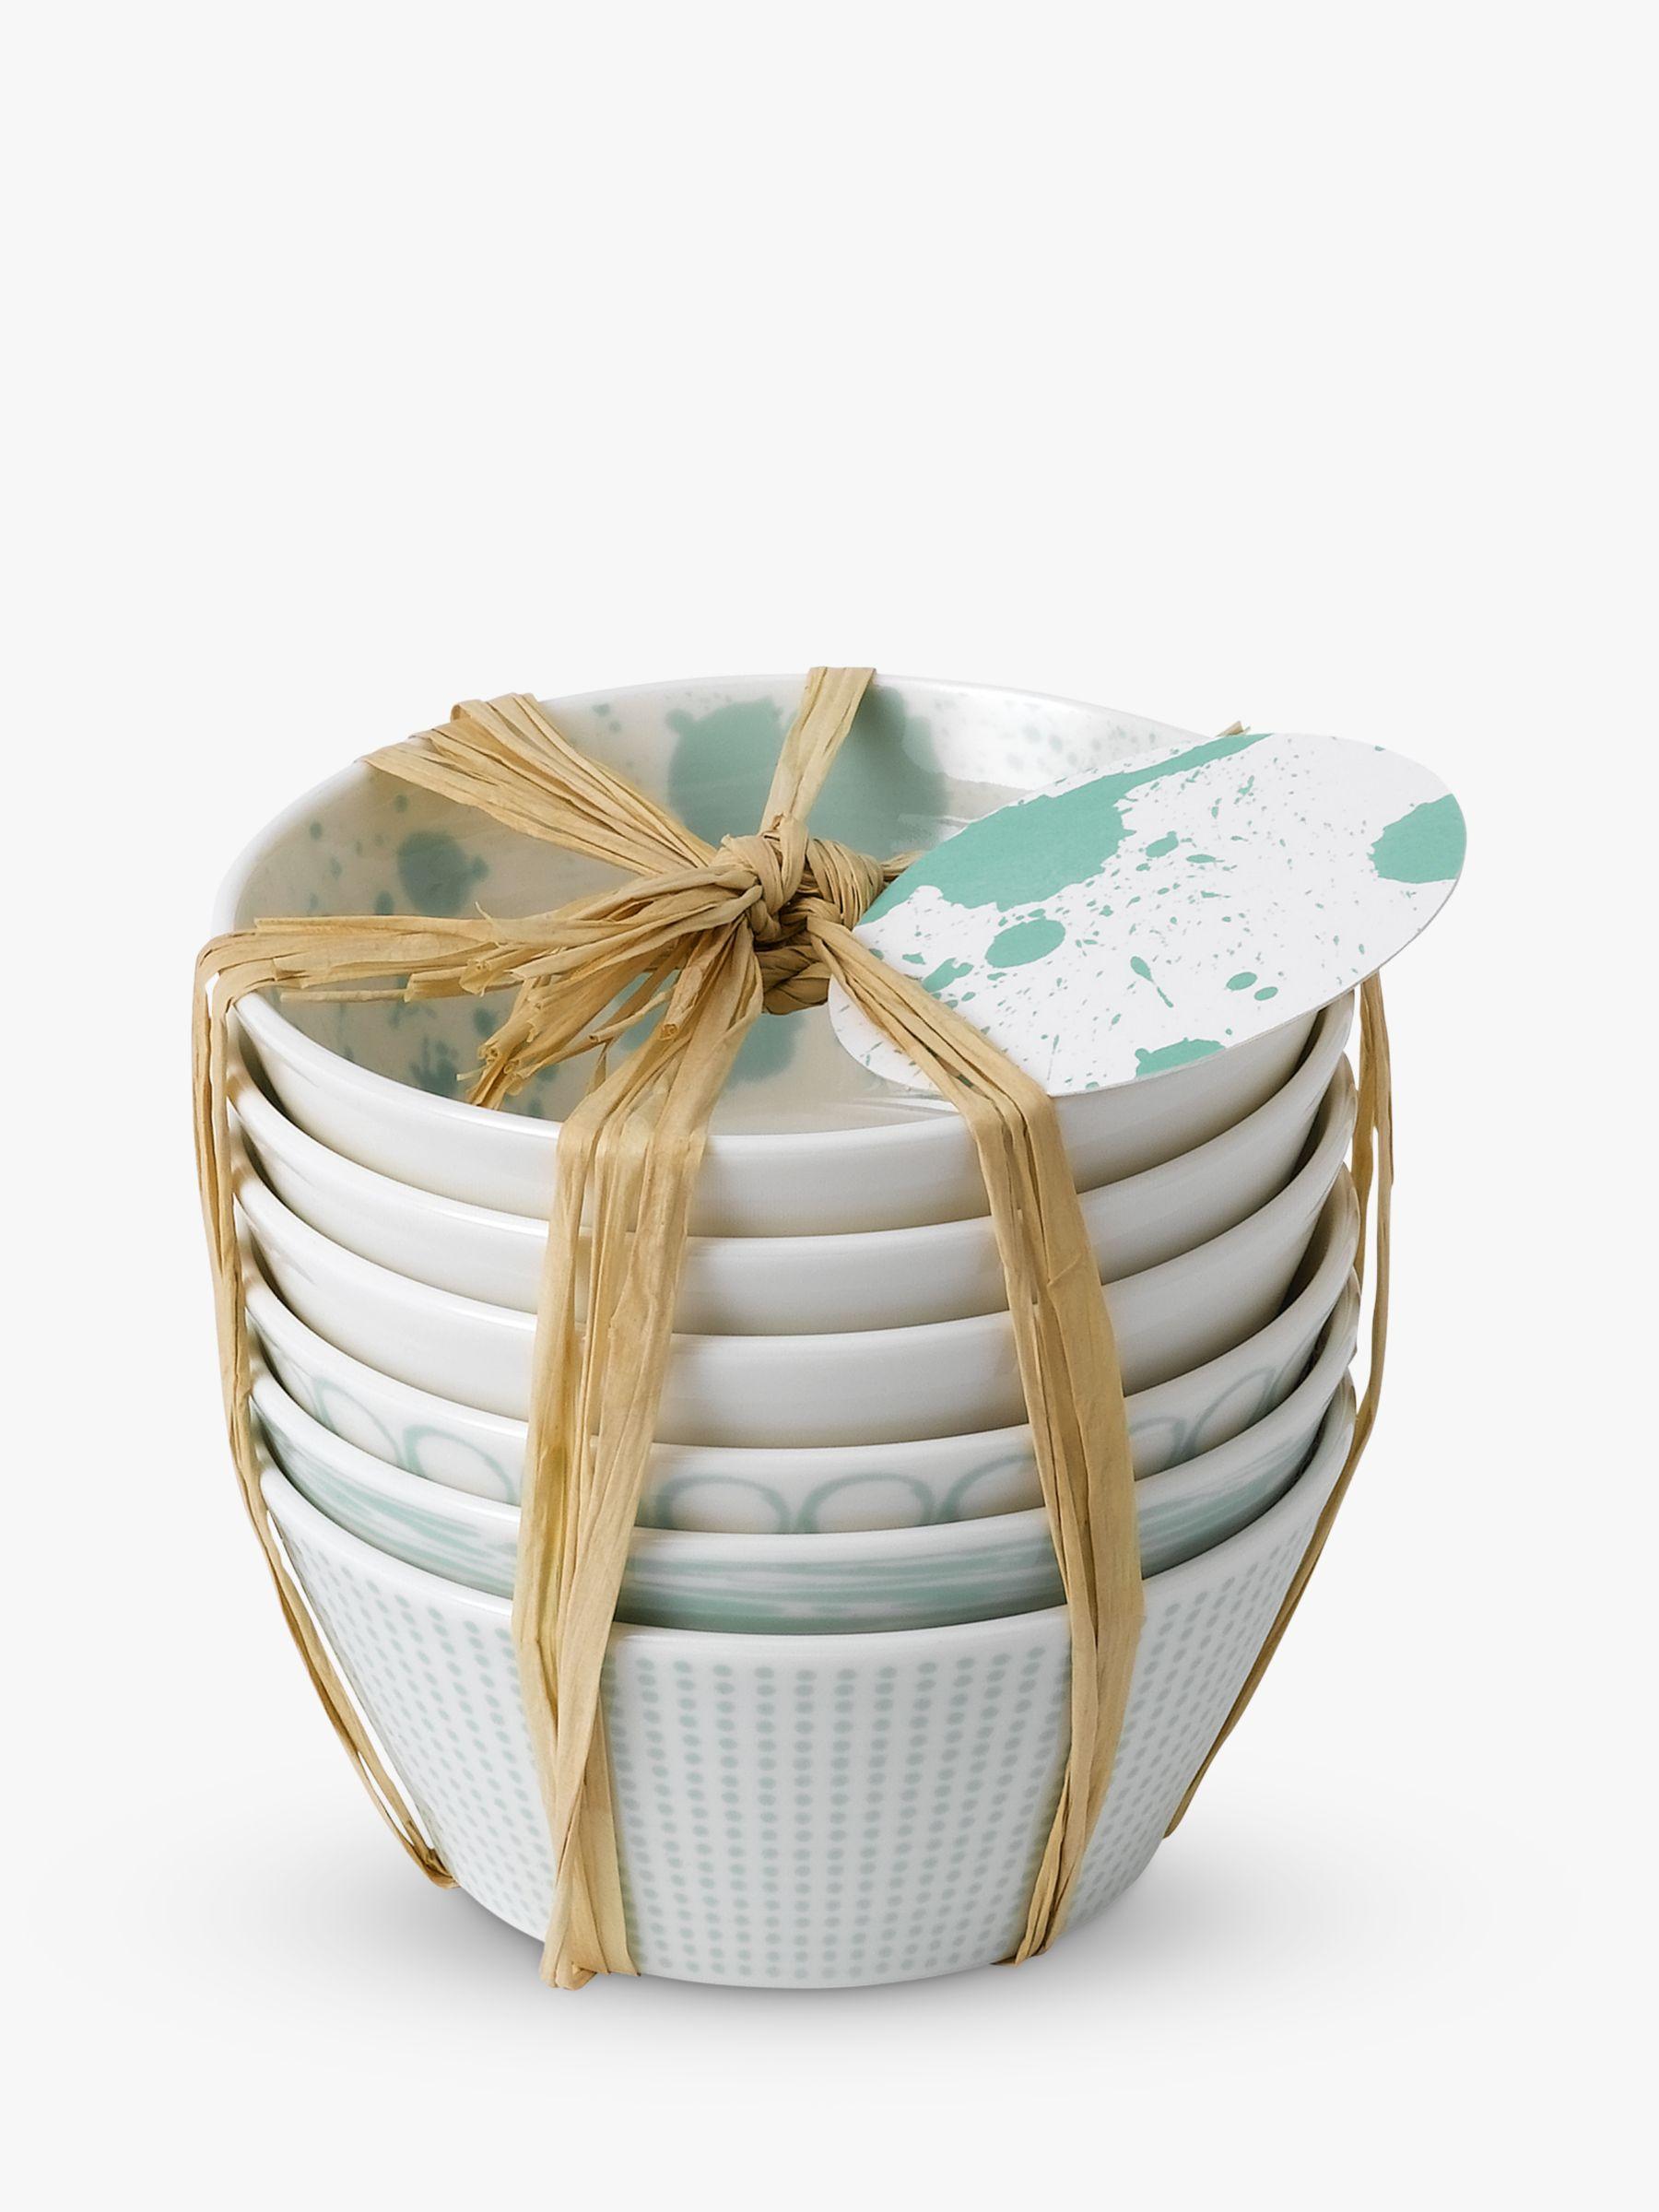 Royal Doulton Royal Doulton Pacific Porcelain Tapas Bowls, Set of 6, 11cm, Mint